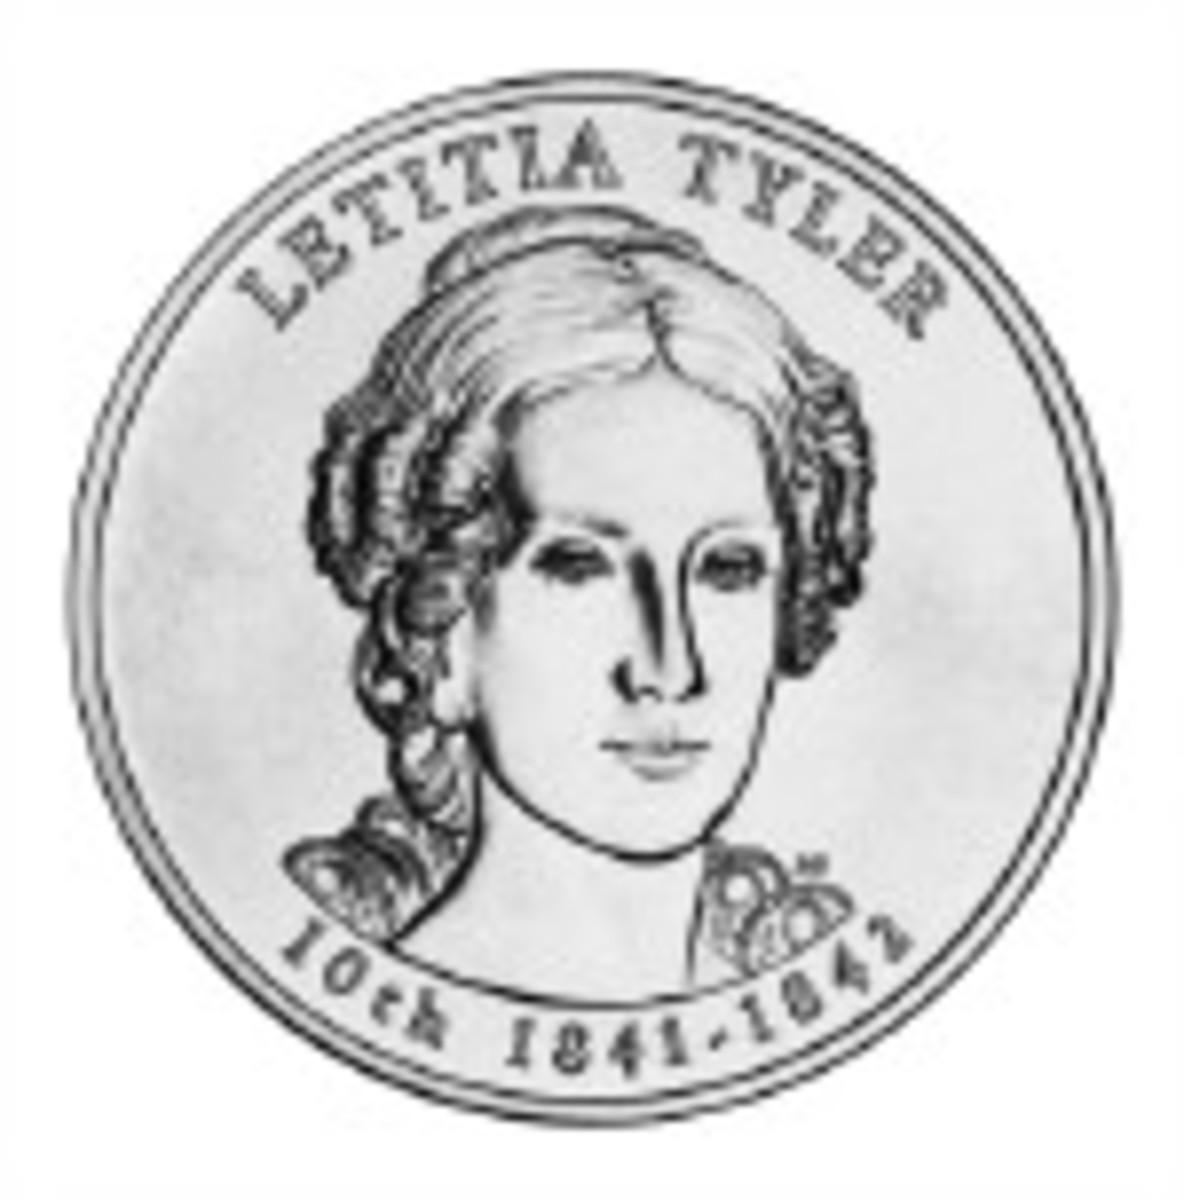 LetitiaTyler_medal_obv_bw.jpg